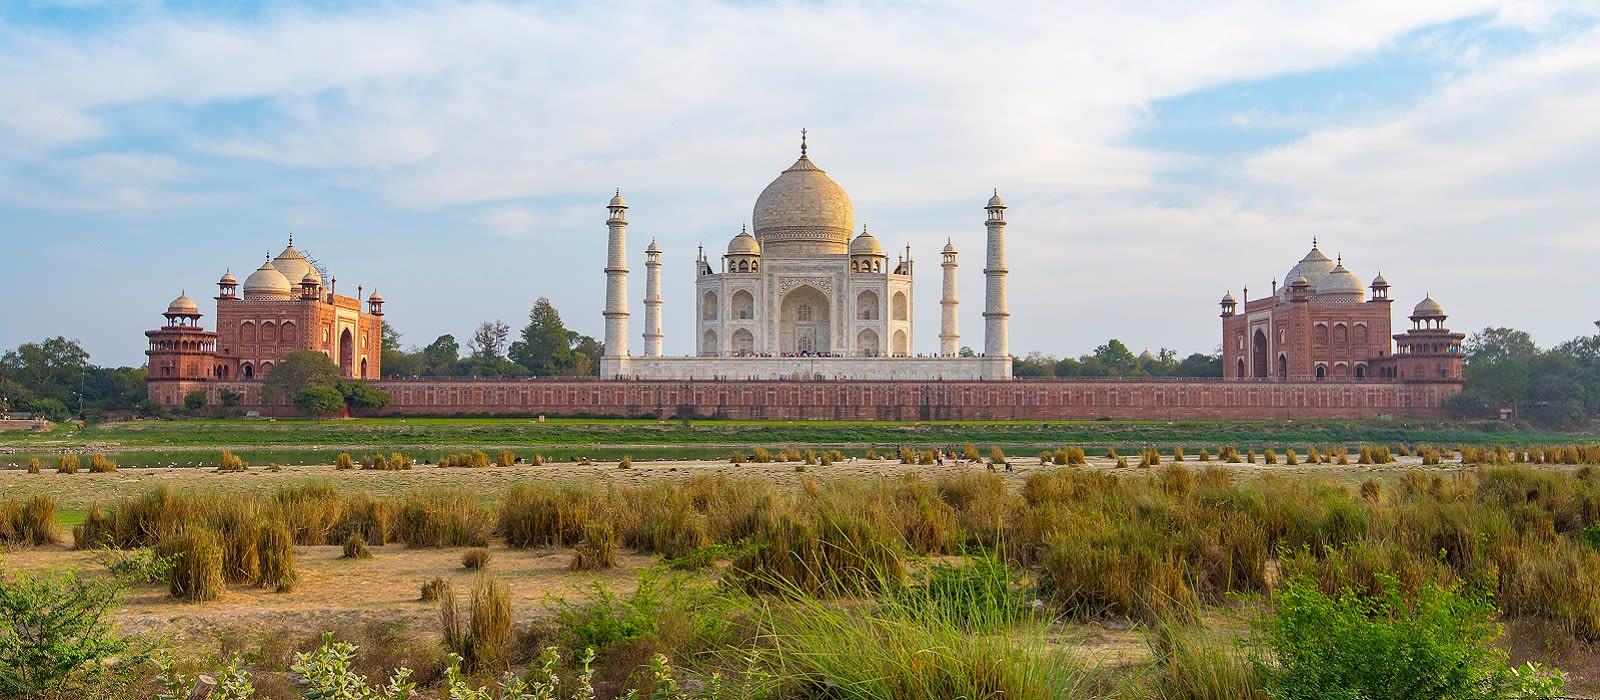 Festival Fever: Diwali in India Tour Trip 2